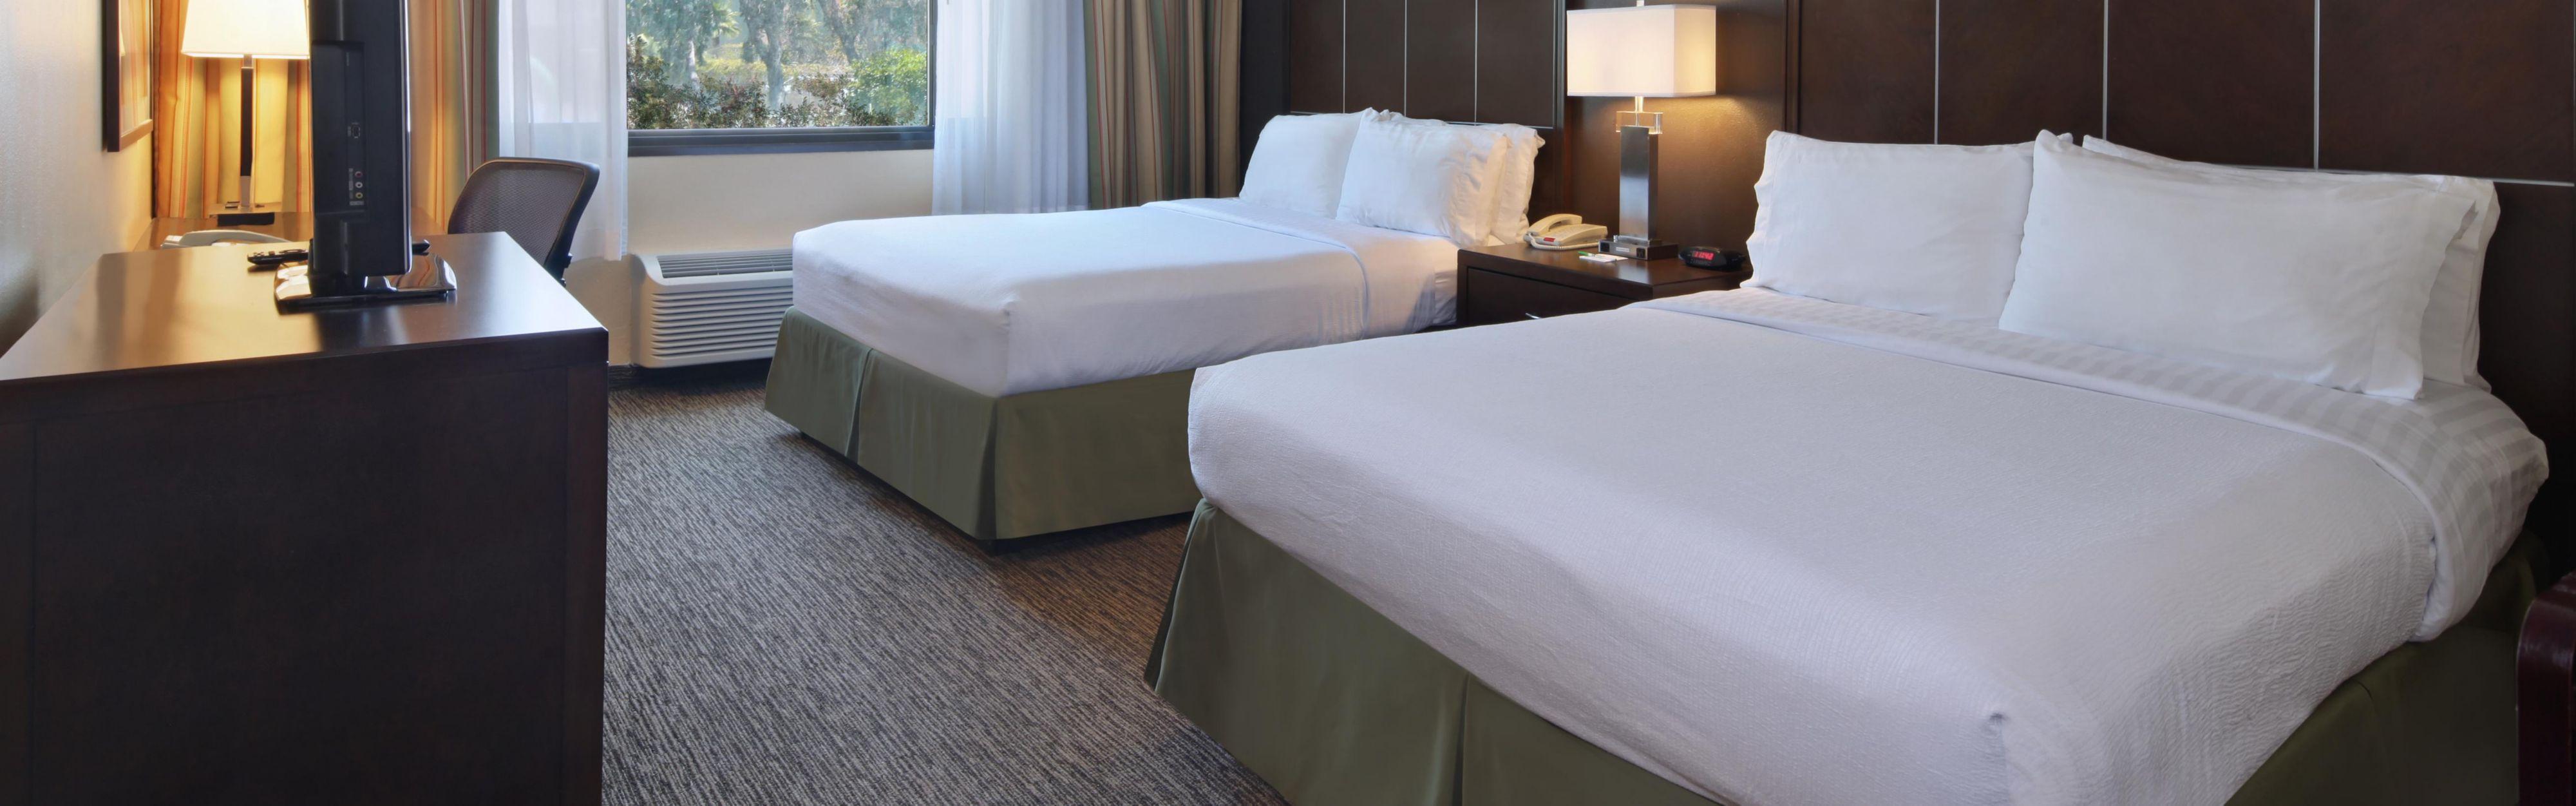 Holiday Inn Anaheim 1 Blk Disneyland 174 At 1240 South